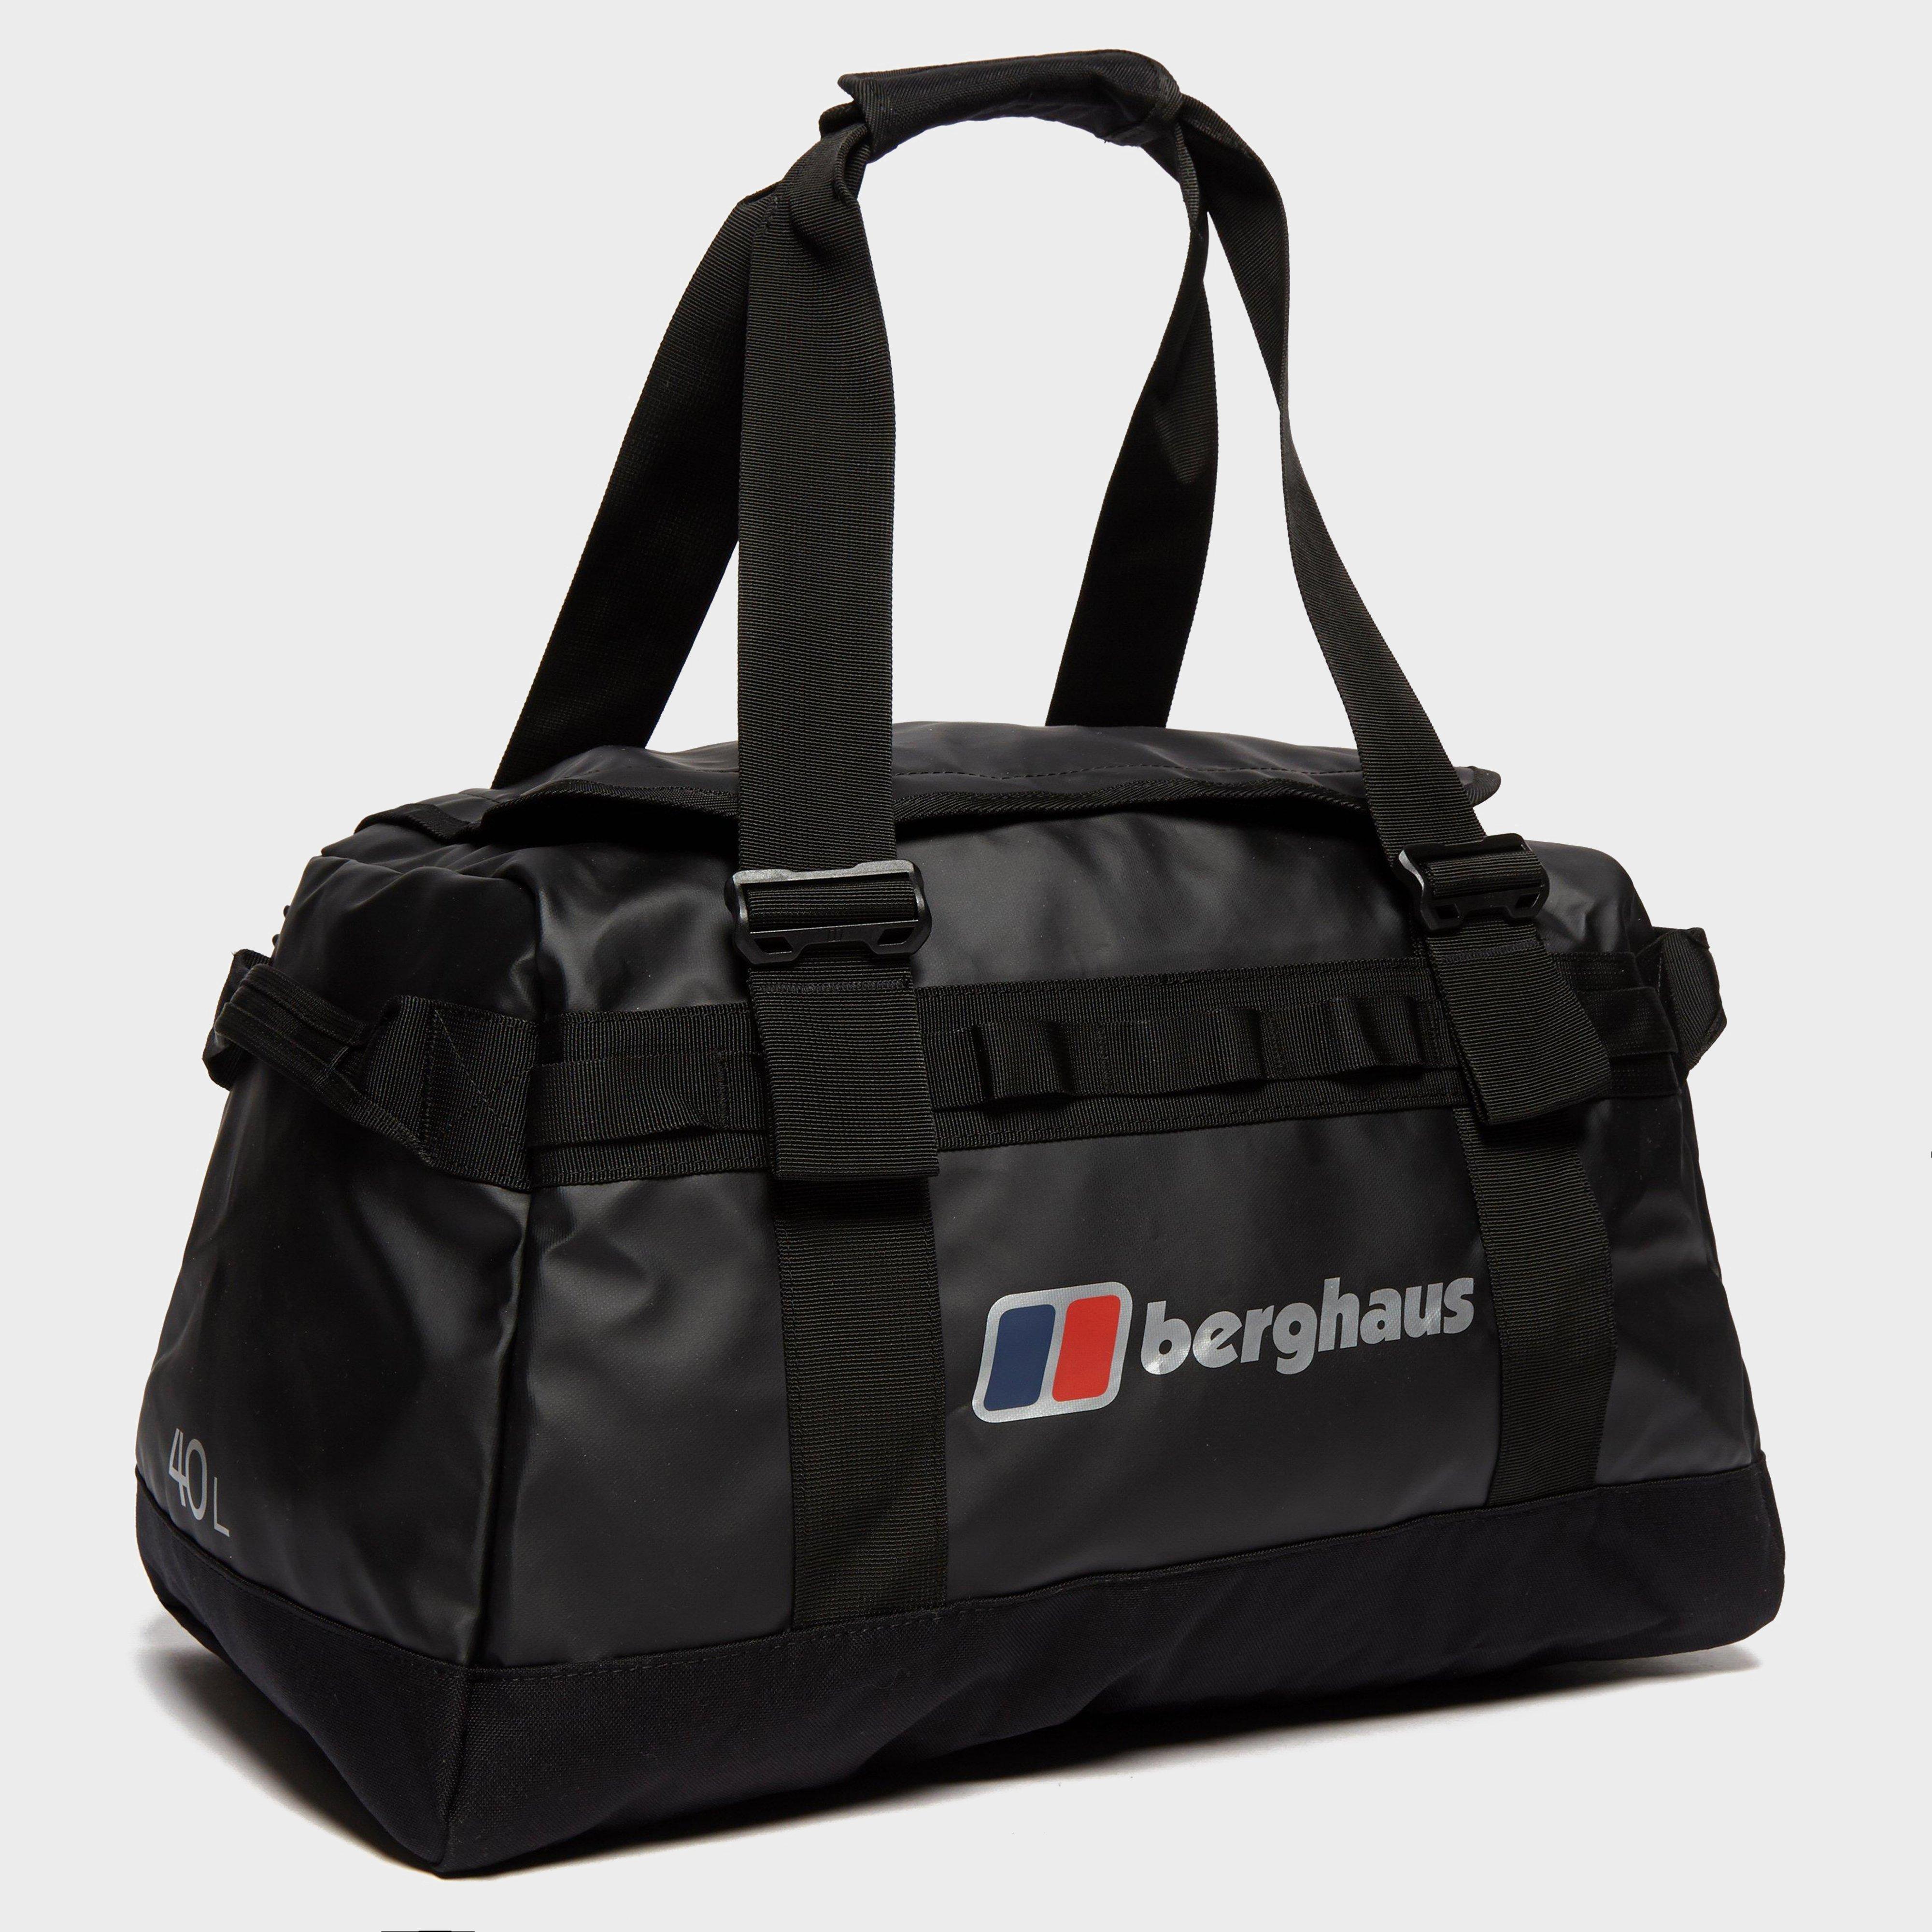 Berghaus Global 40l Holdall - Black  Black